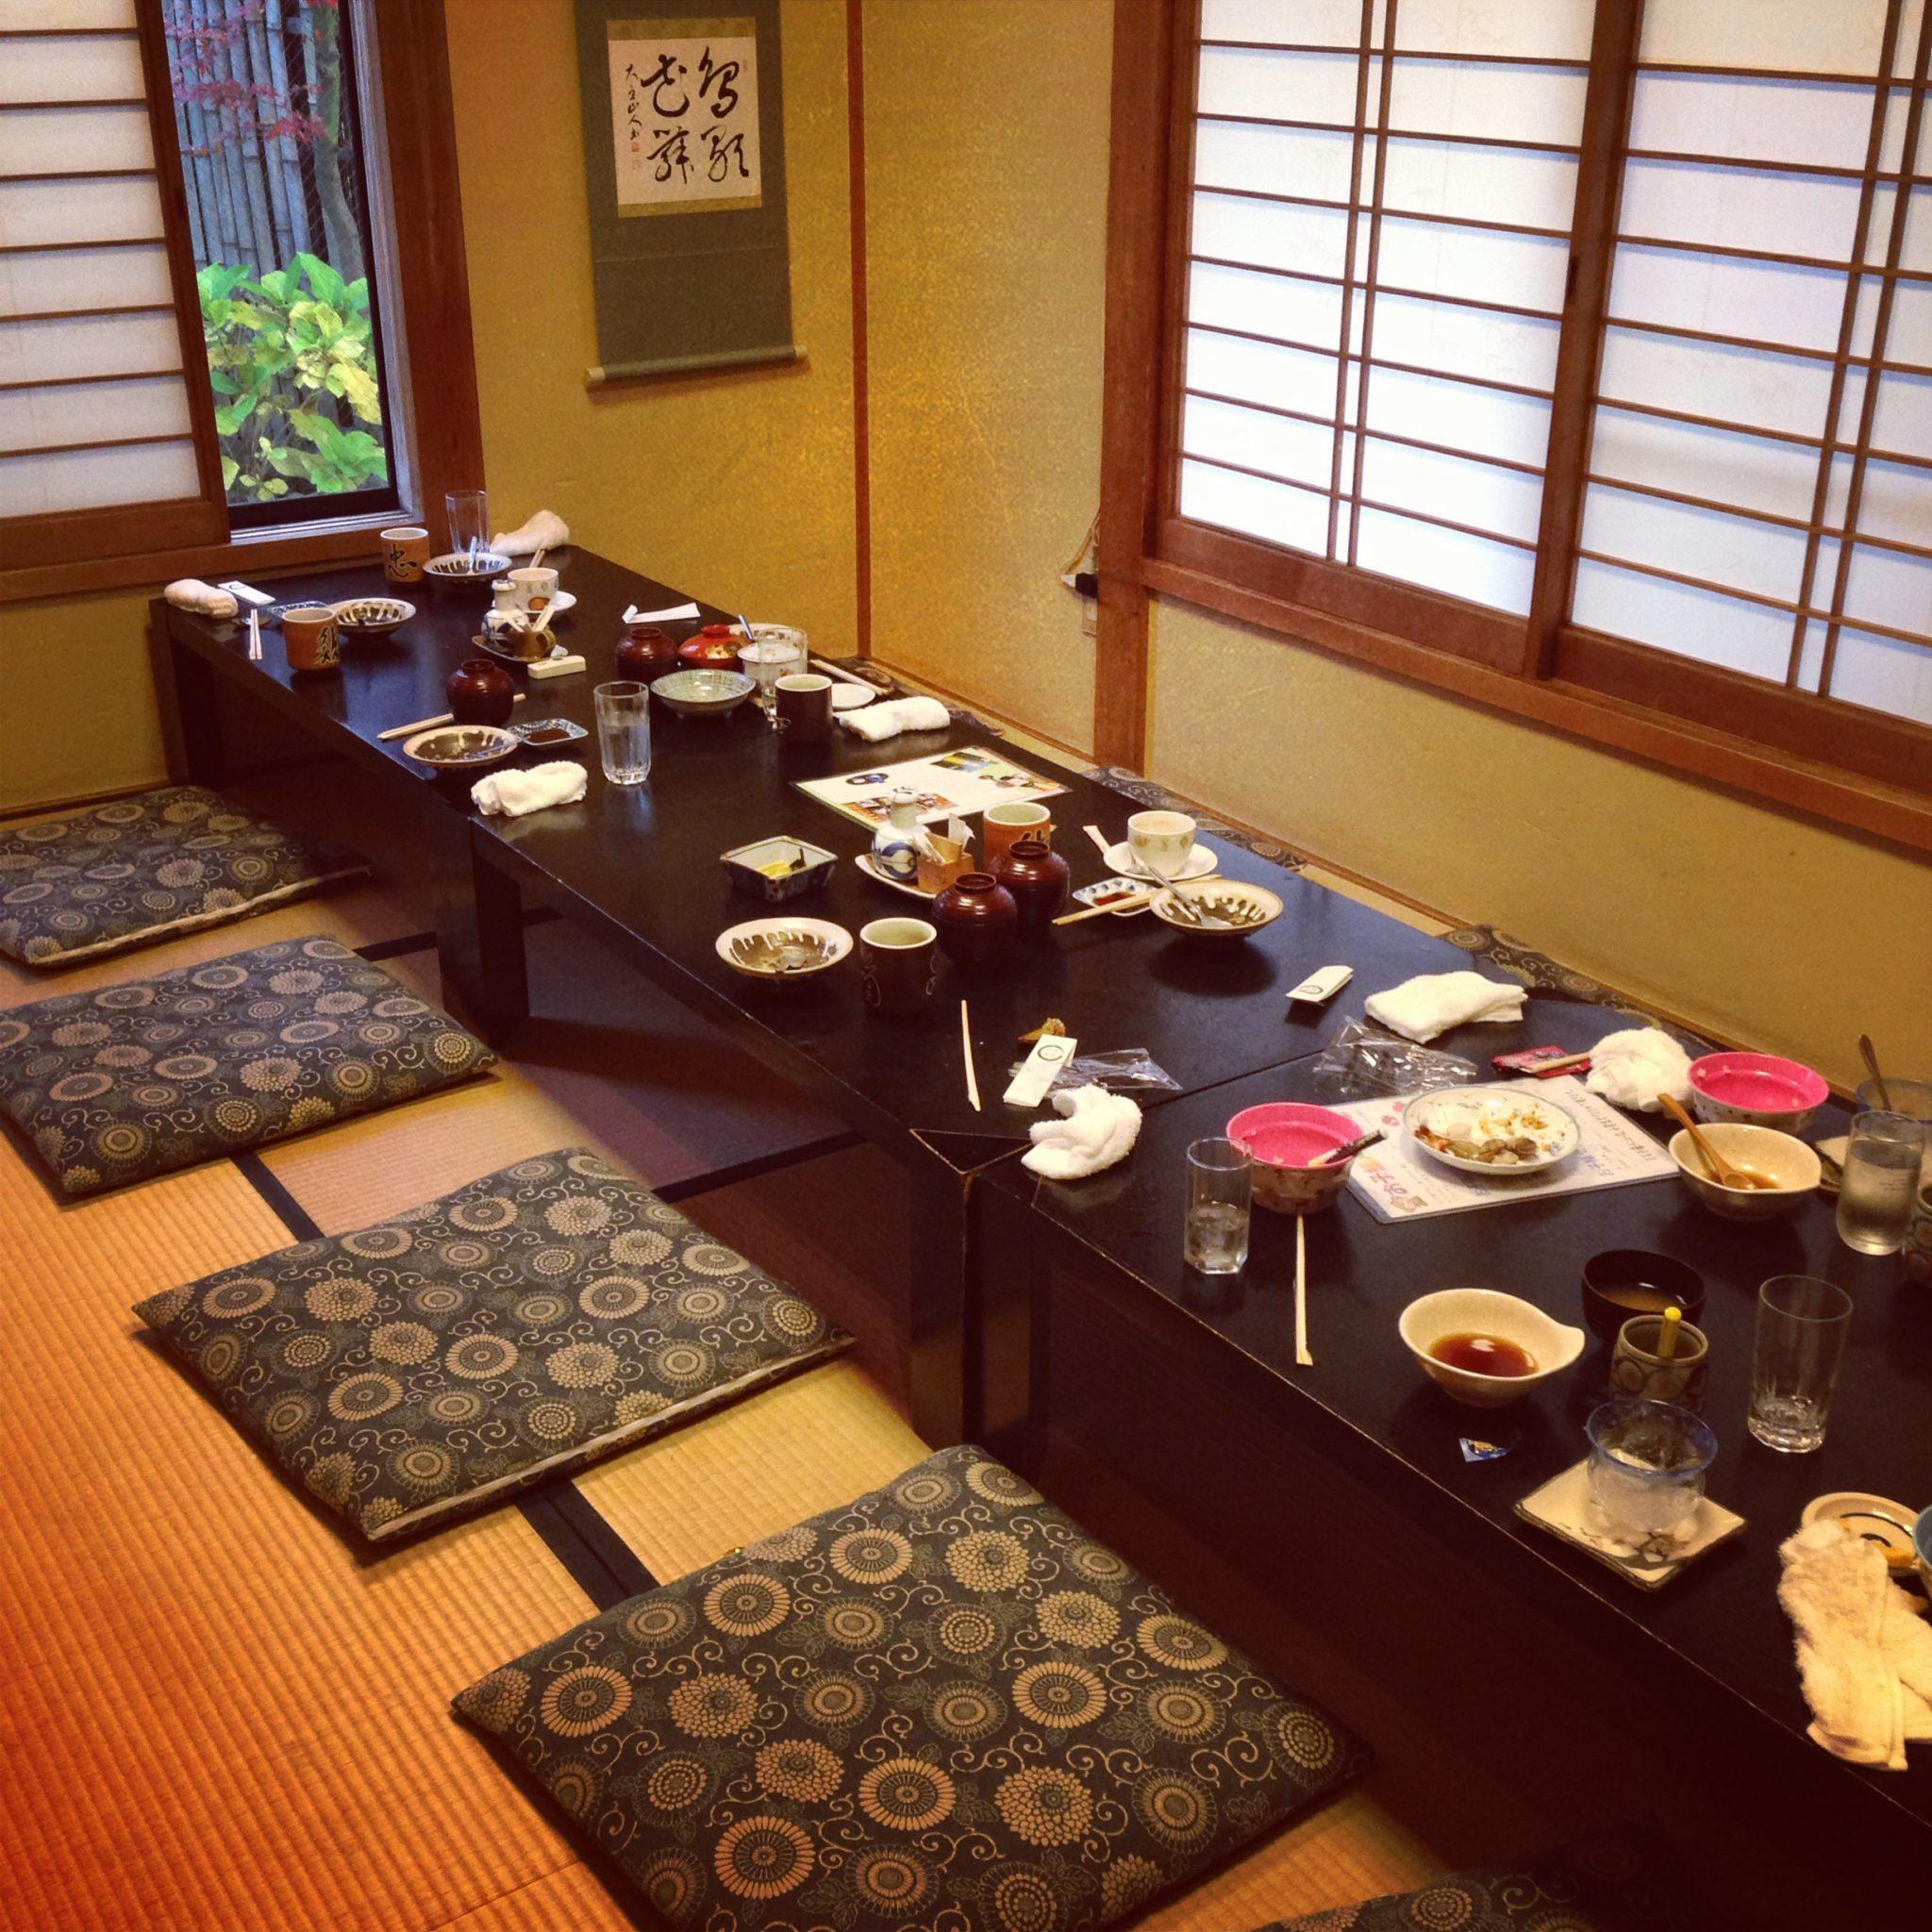 Sitting Cross Legged Floor Eat Asian Indian Culture Benefits Sukhasana